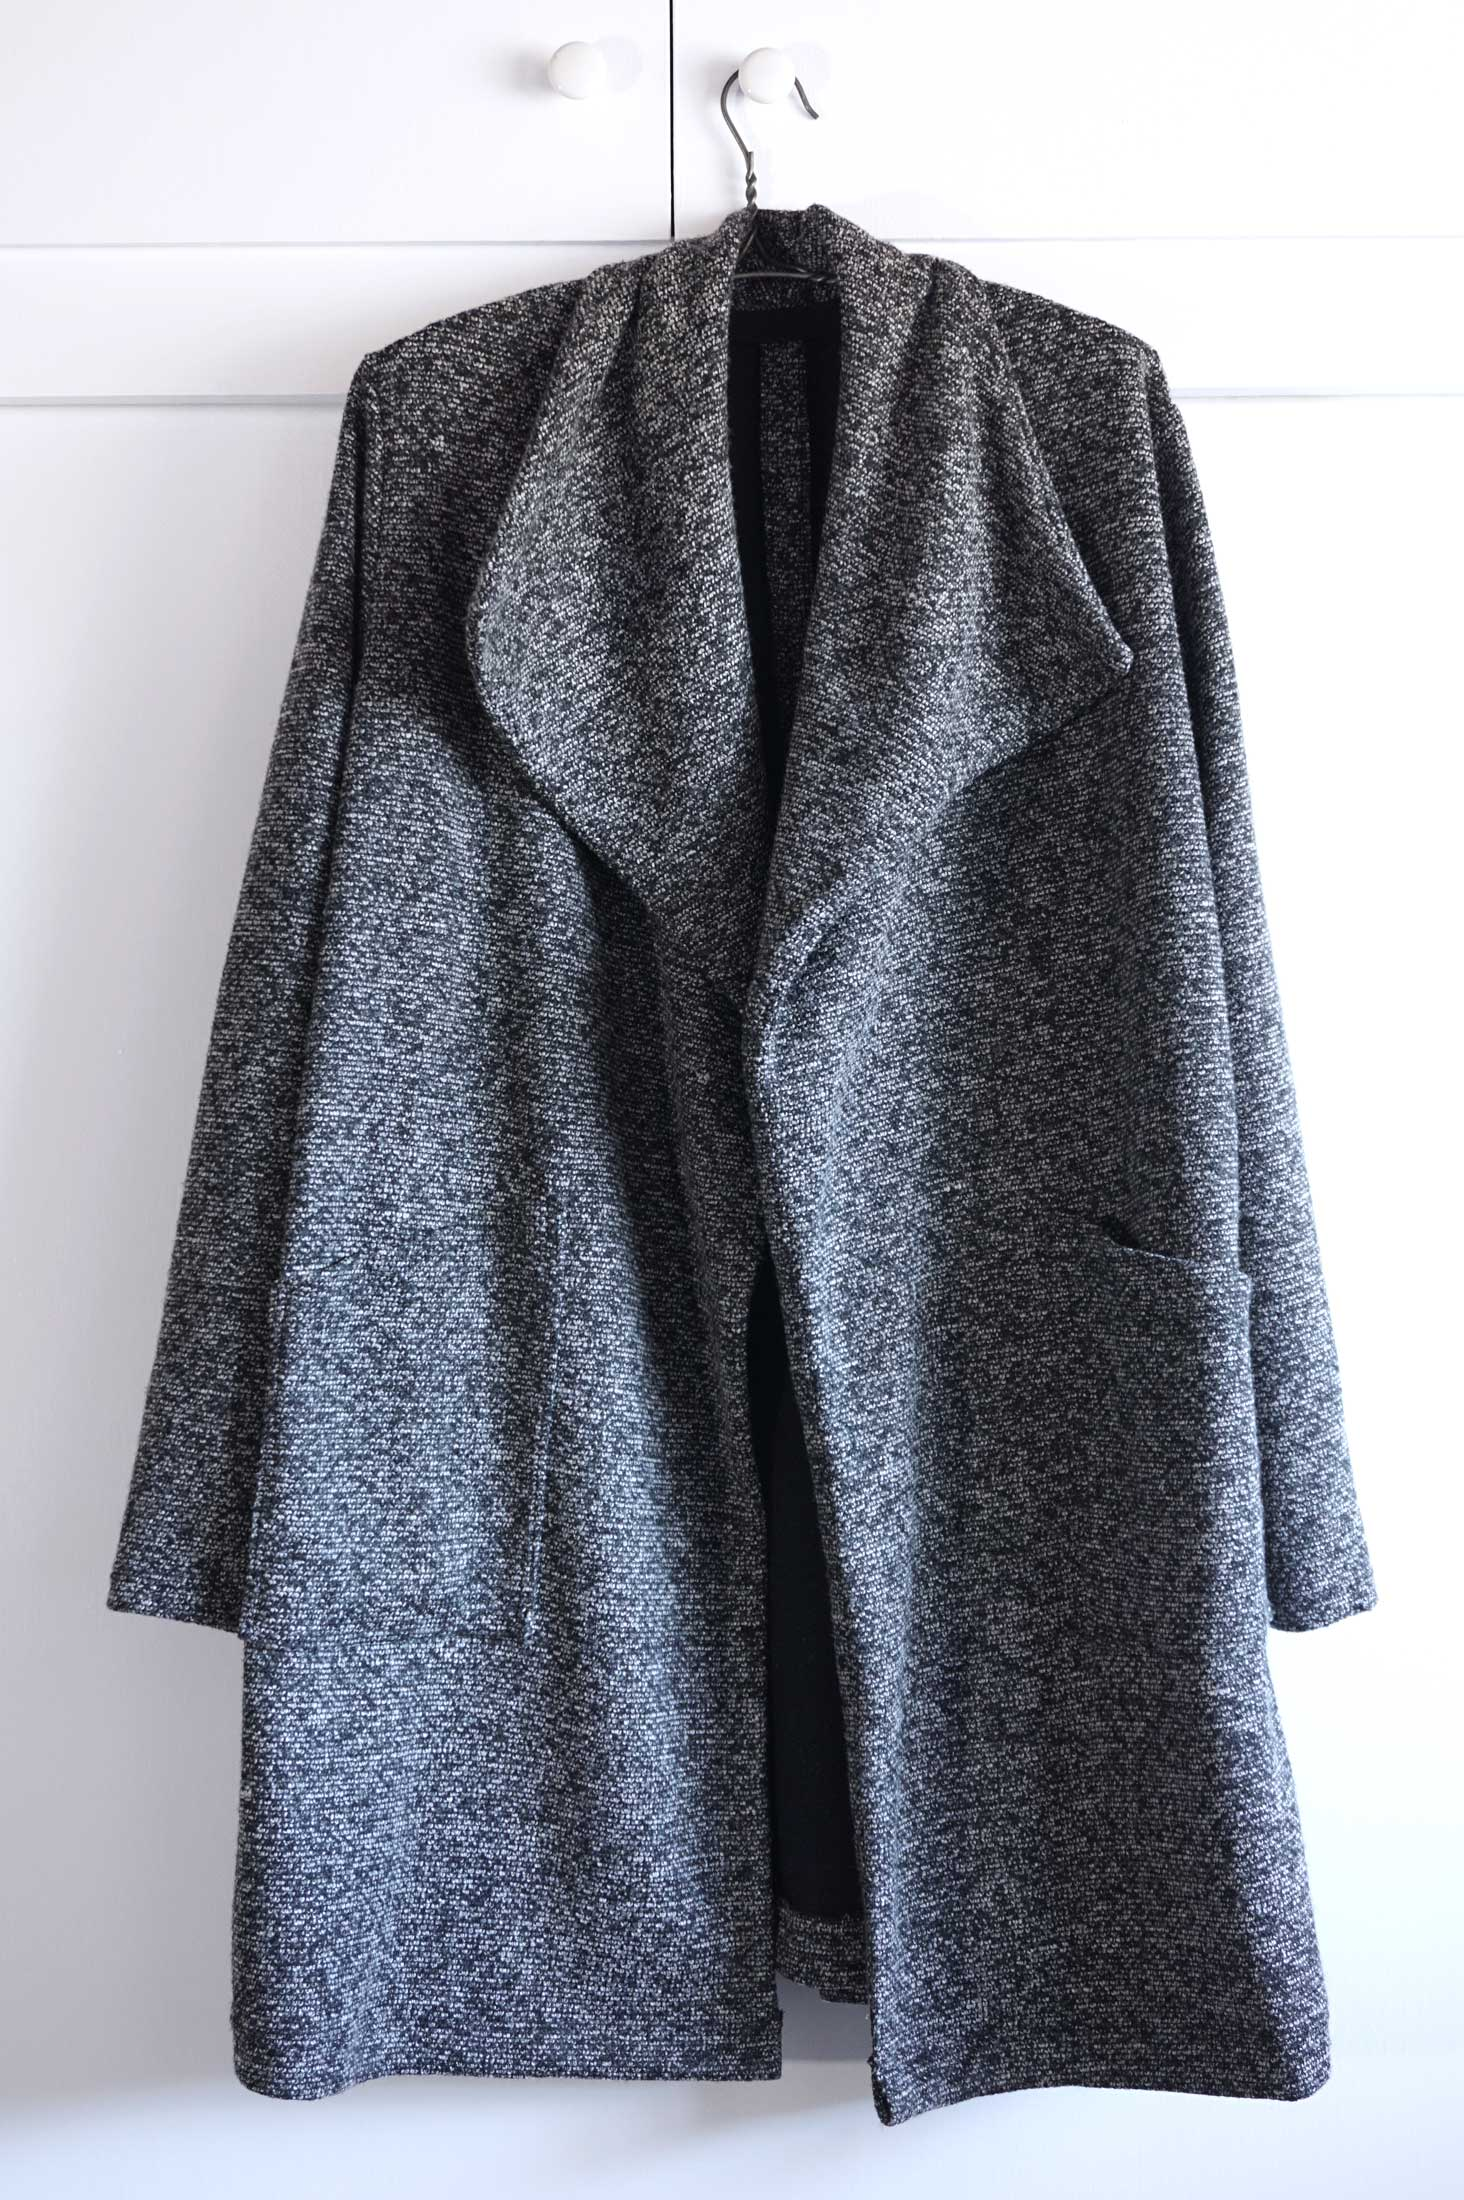 DIY Boucle Coatigan –Review of the Jill Coat by Seamwork | Sew DIY